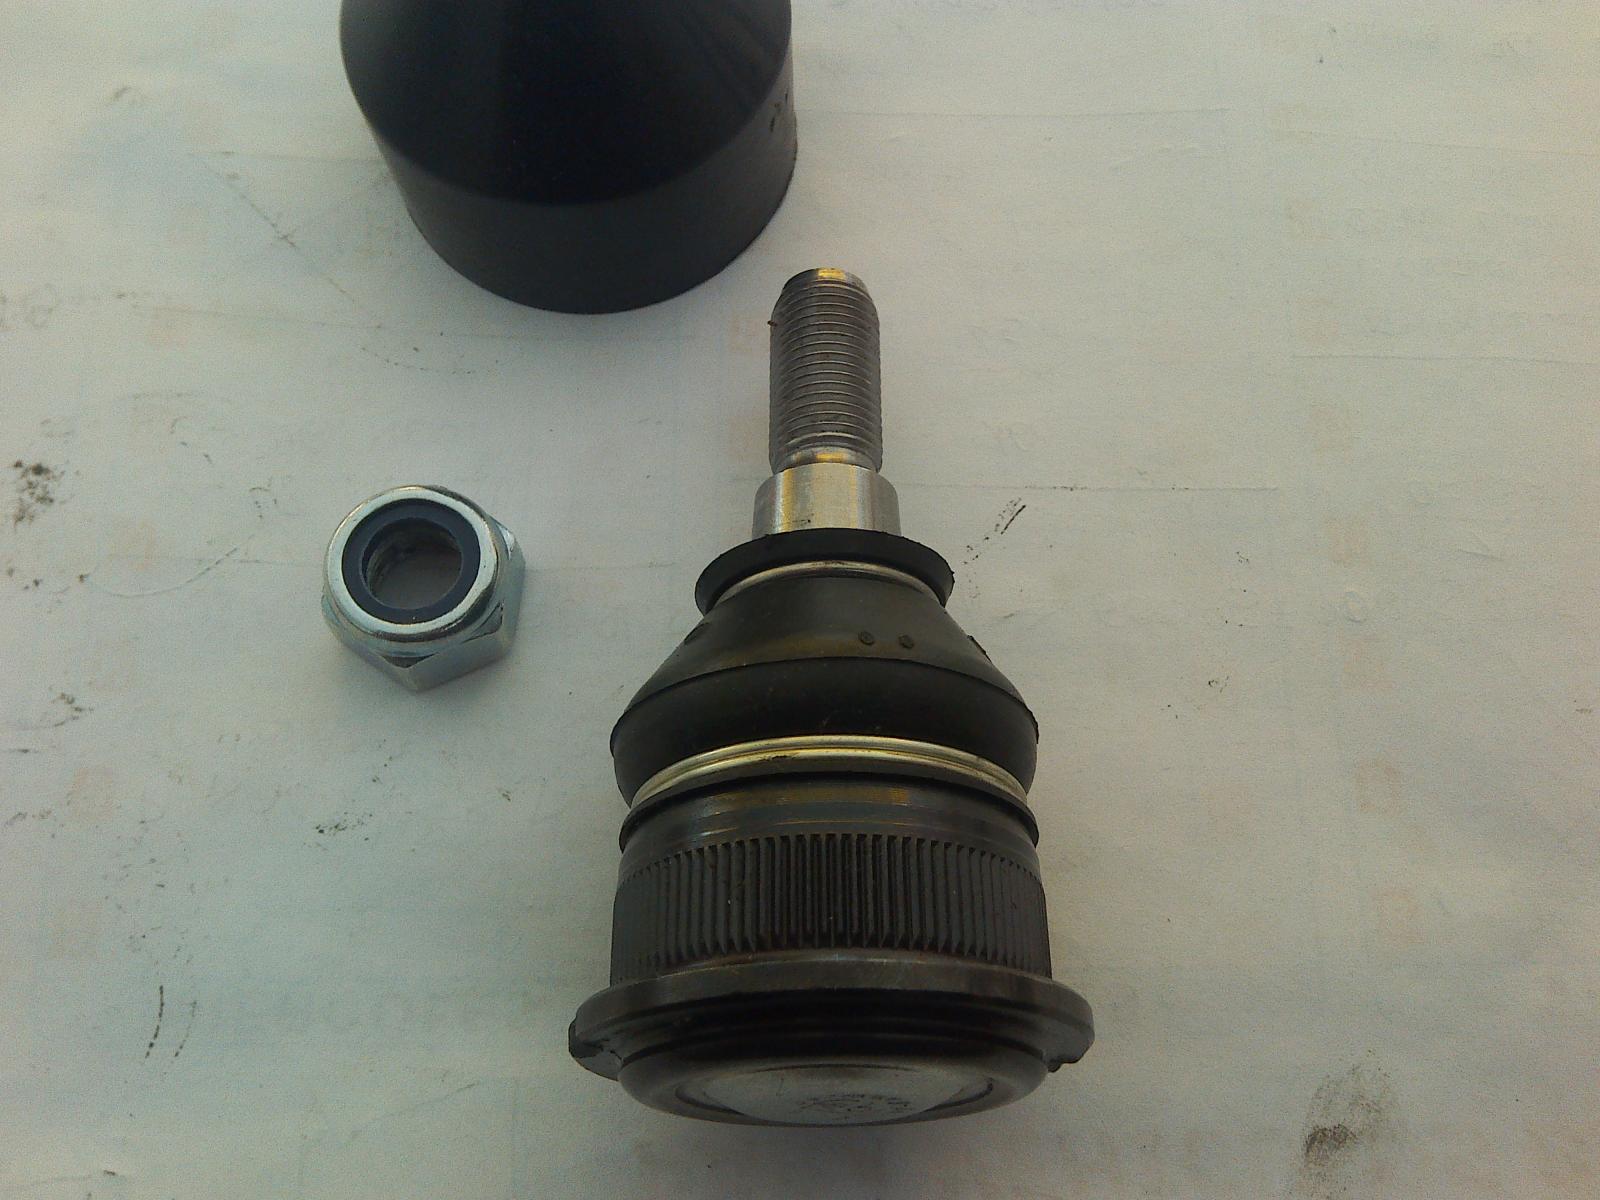 Rotula suspensión inferior Volkswagen Beetle